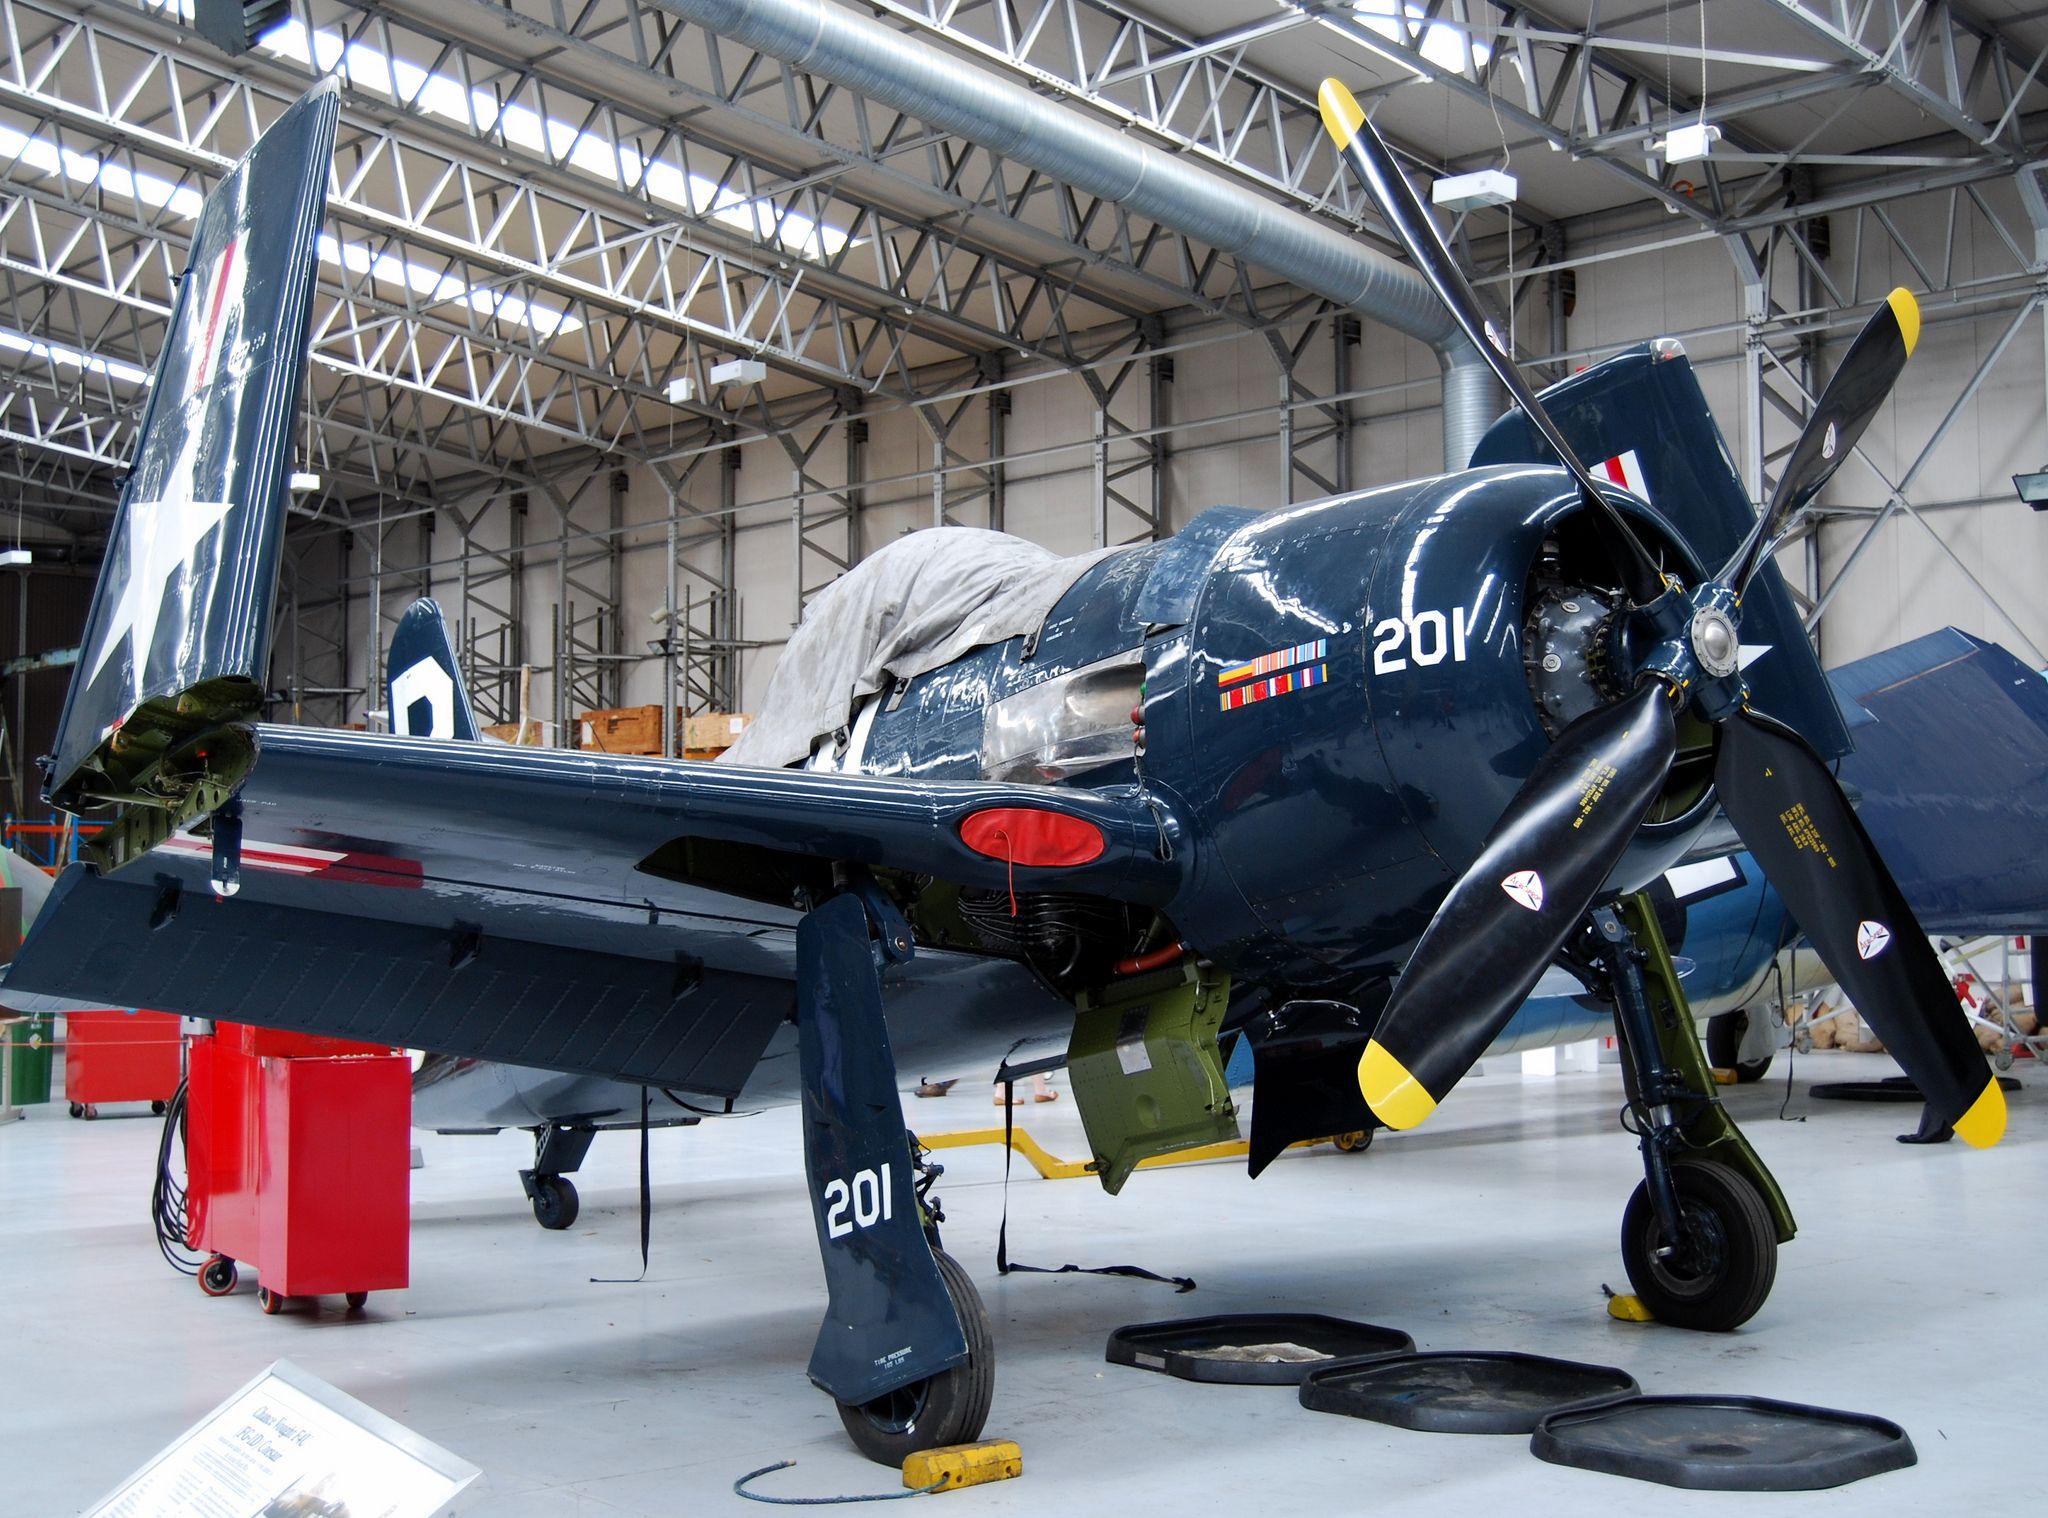 Grumman FF Bearcat Imperial War Museum Duxford Fighters - War museums in usa